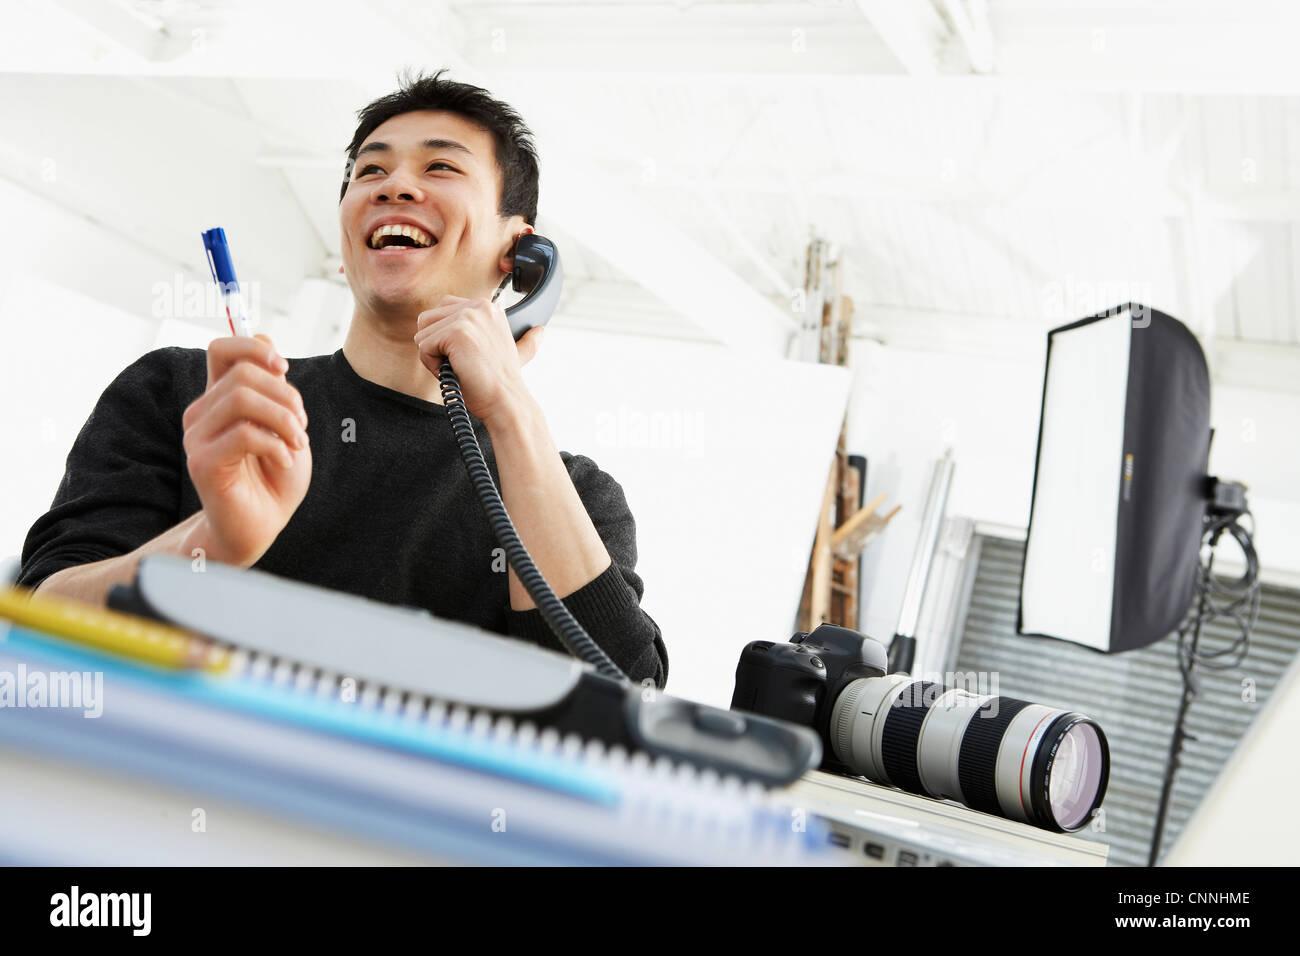 Photographer talking on phone at desk - Stock Image